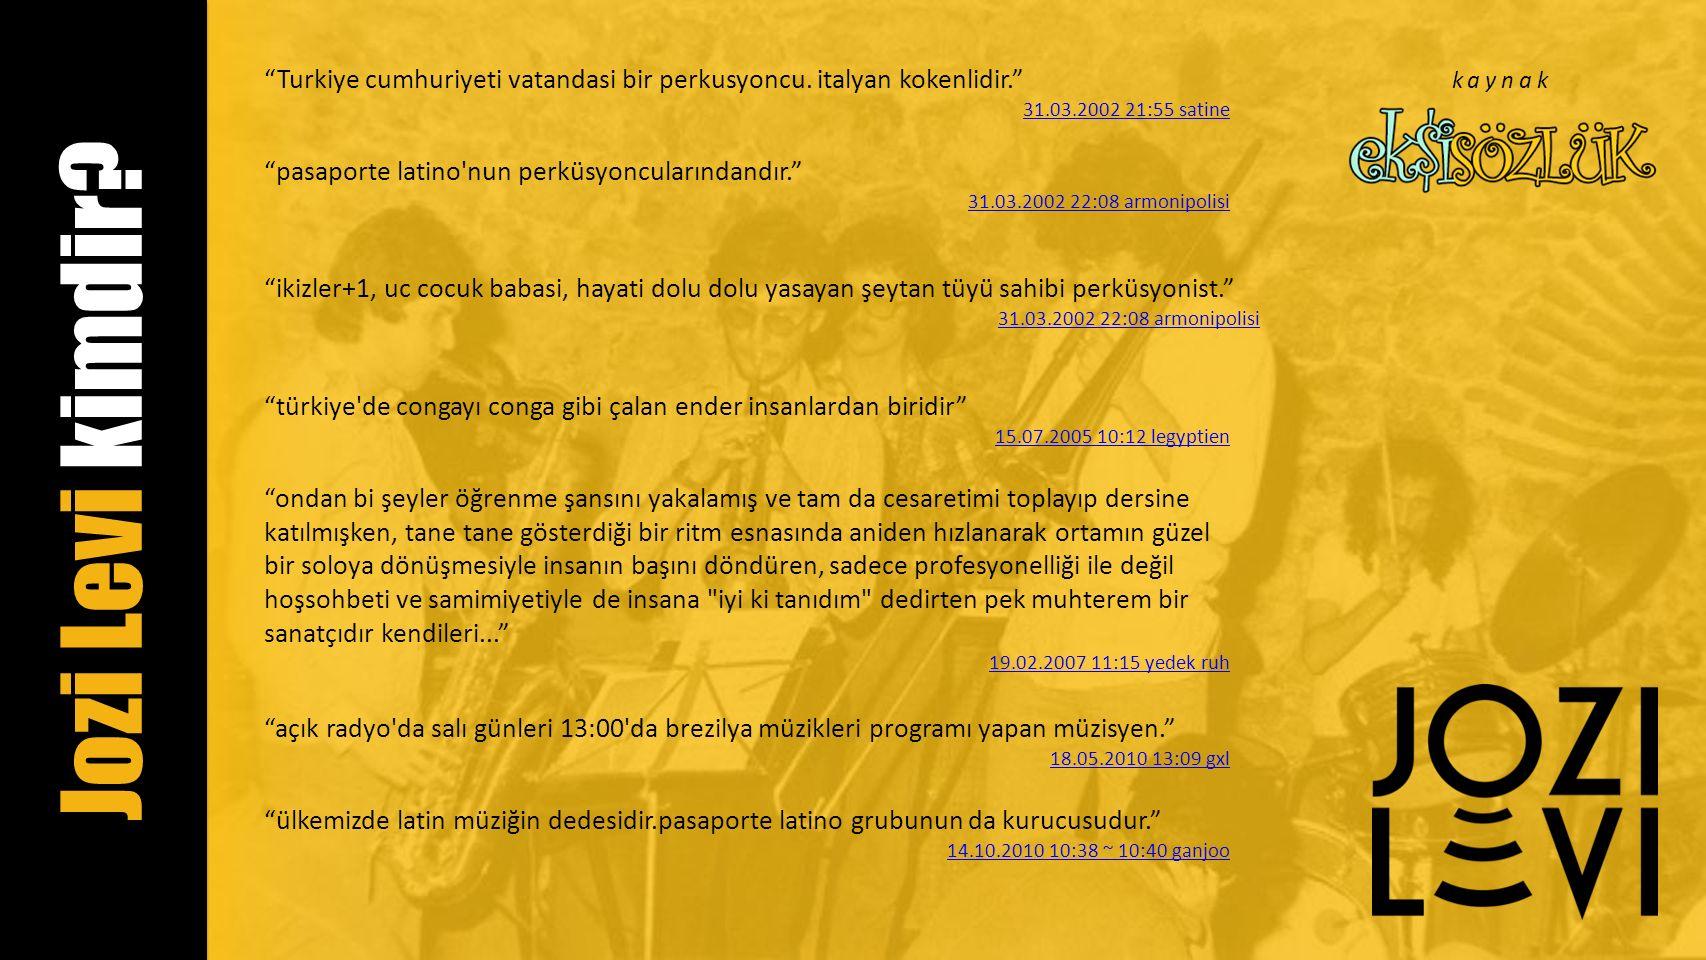 Jozi Levi kimdir. Turkiye cumhuriyeti vatandasi bir perkusyoncu.